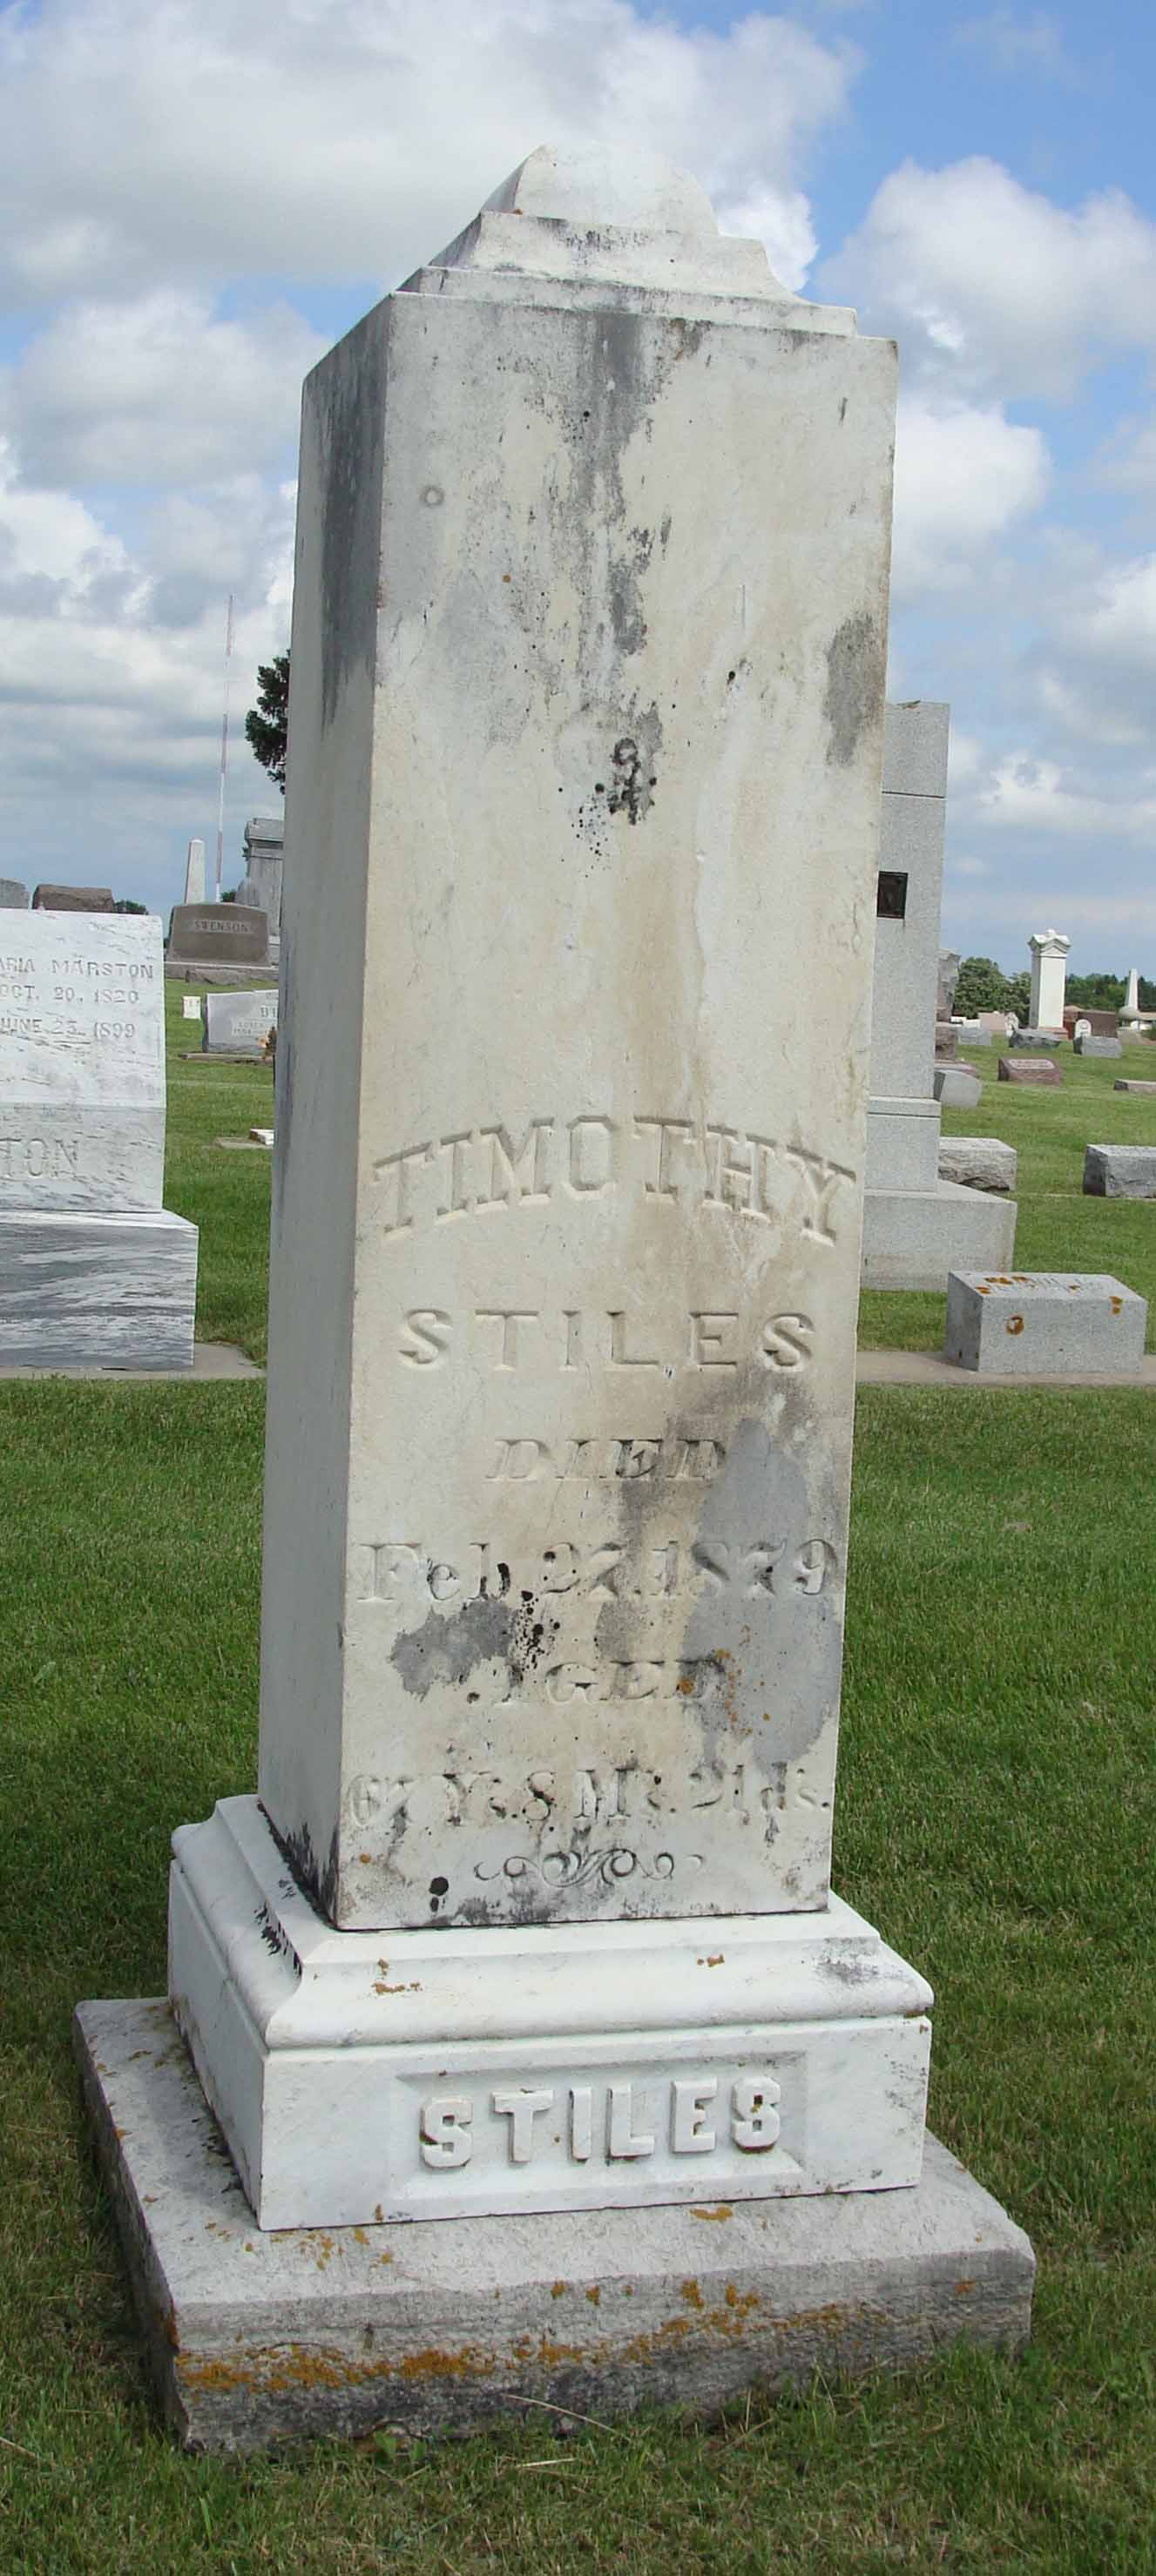 Timothy Stiles